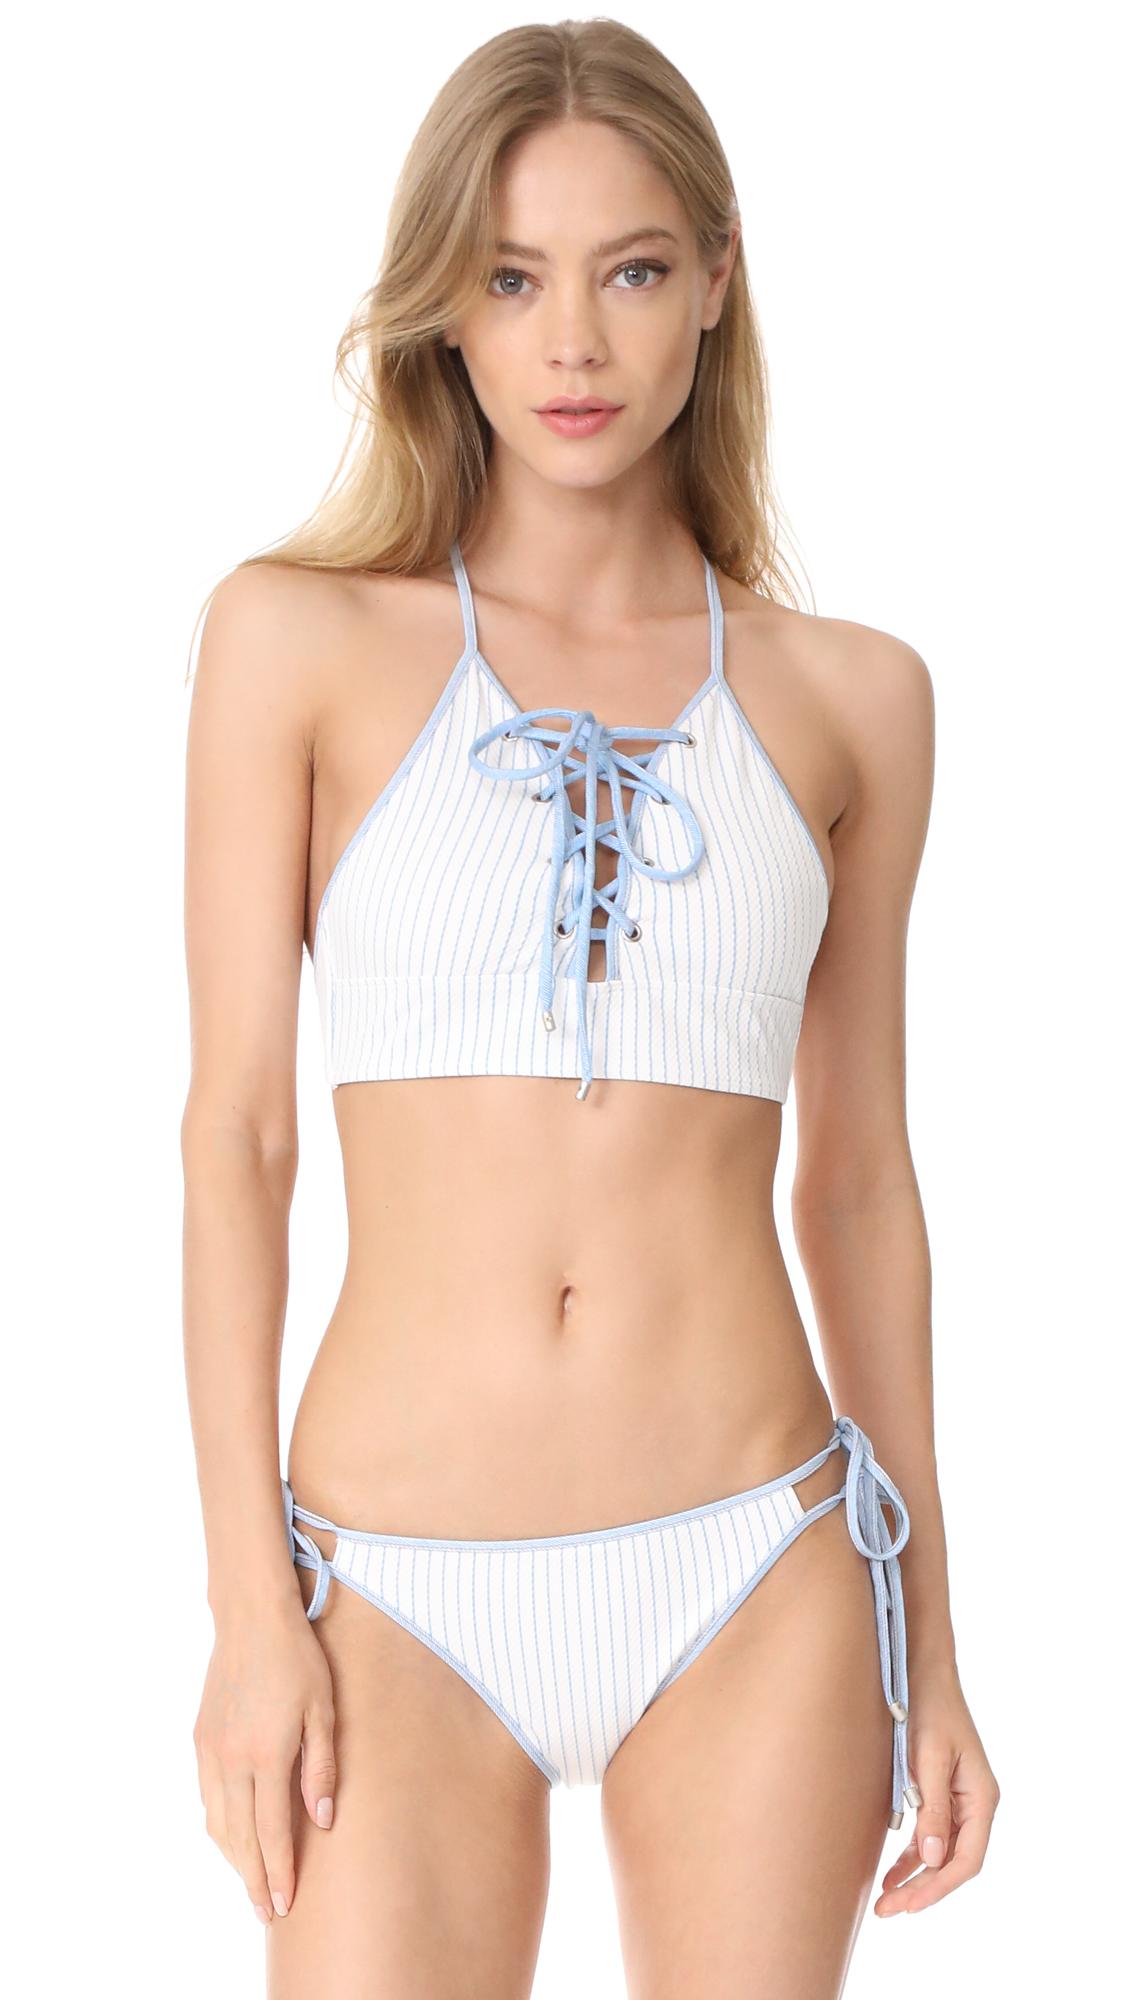 Jonathan Simkhai Lace Up Bikini Top with Grommets - Bright White/Blue Pinstripe